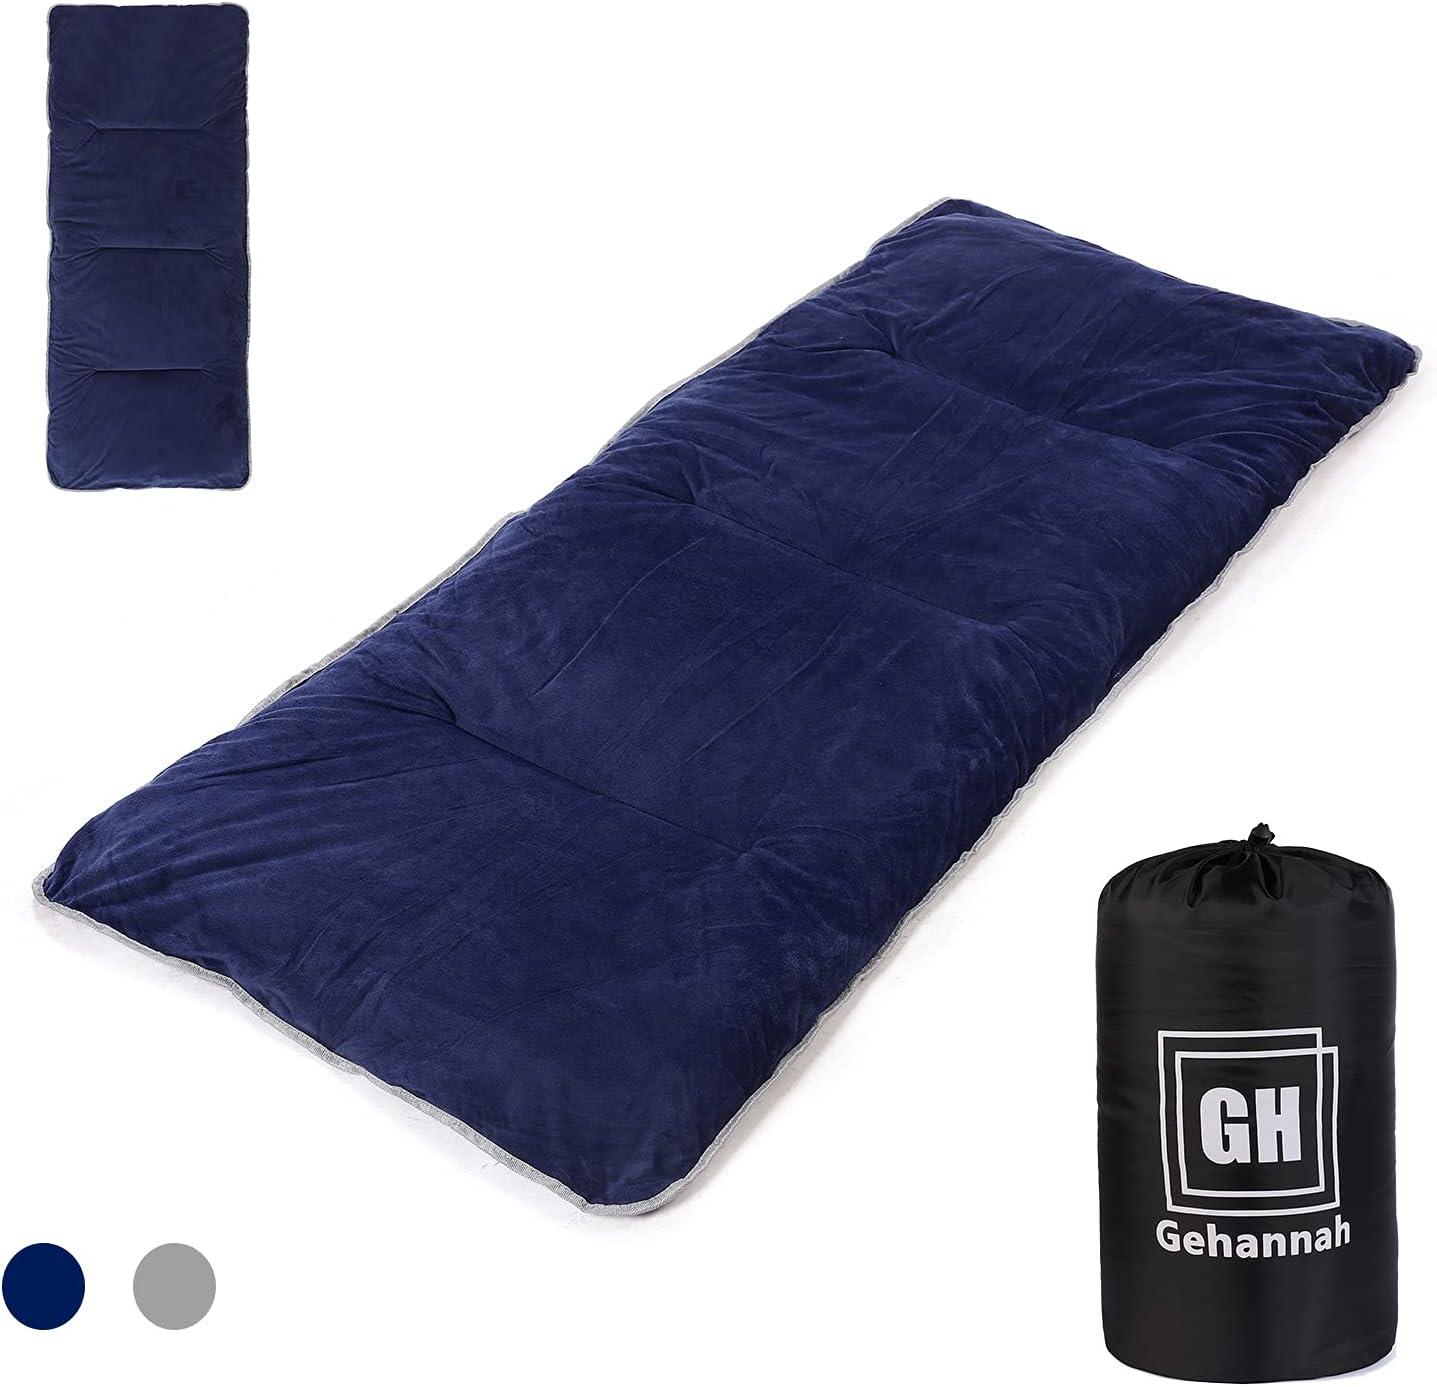 Gehannah Camping Sleeping All items free shipping 5 ☆ popular Pad,Soft Cotton Comfortable P Cot